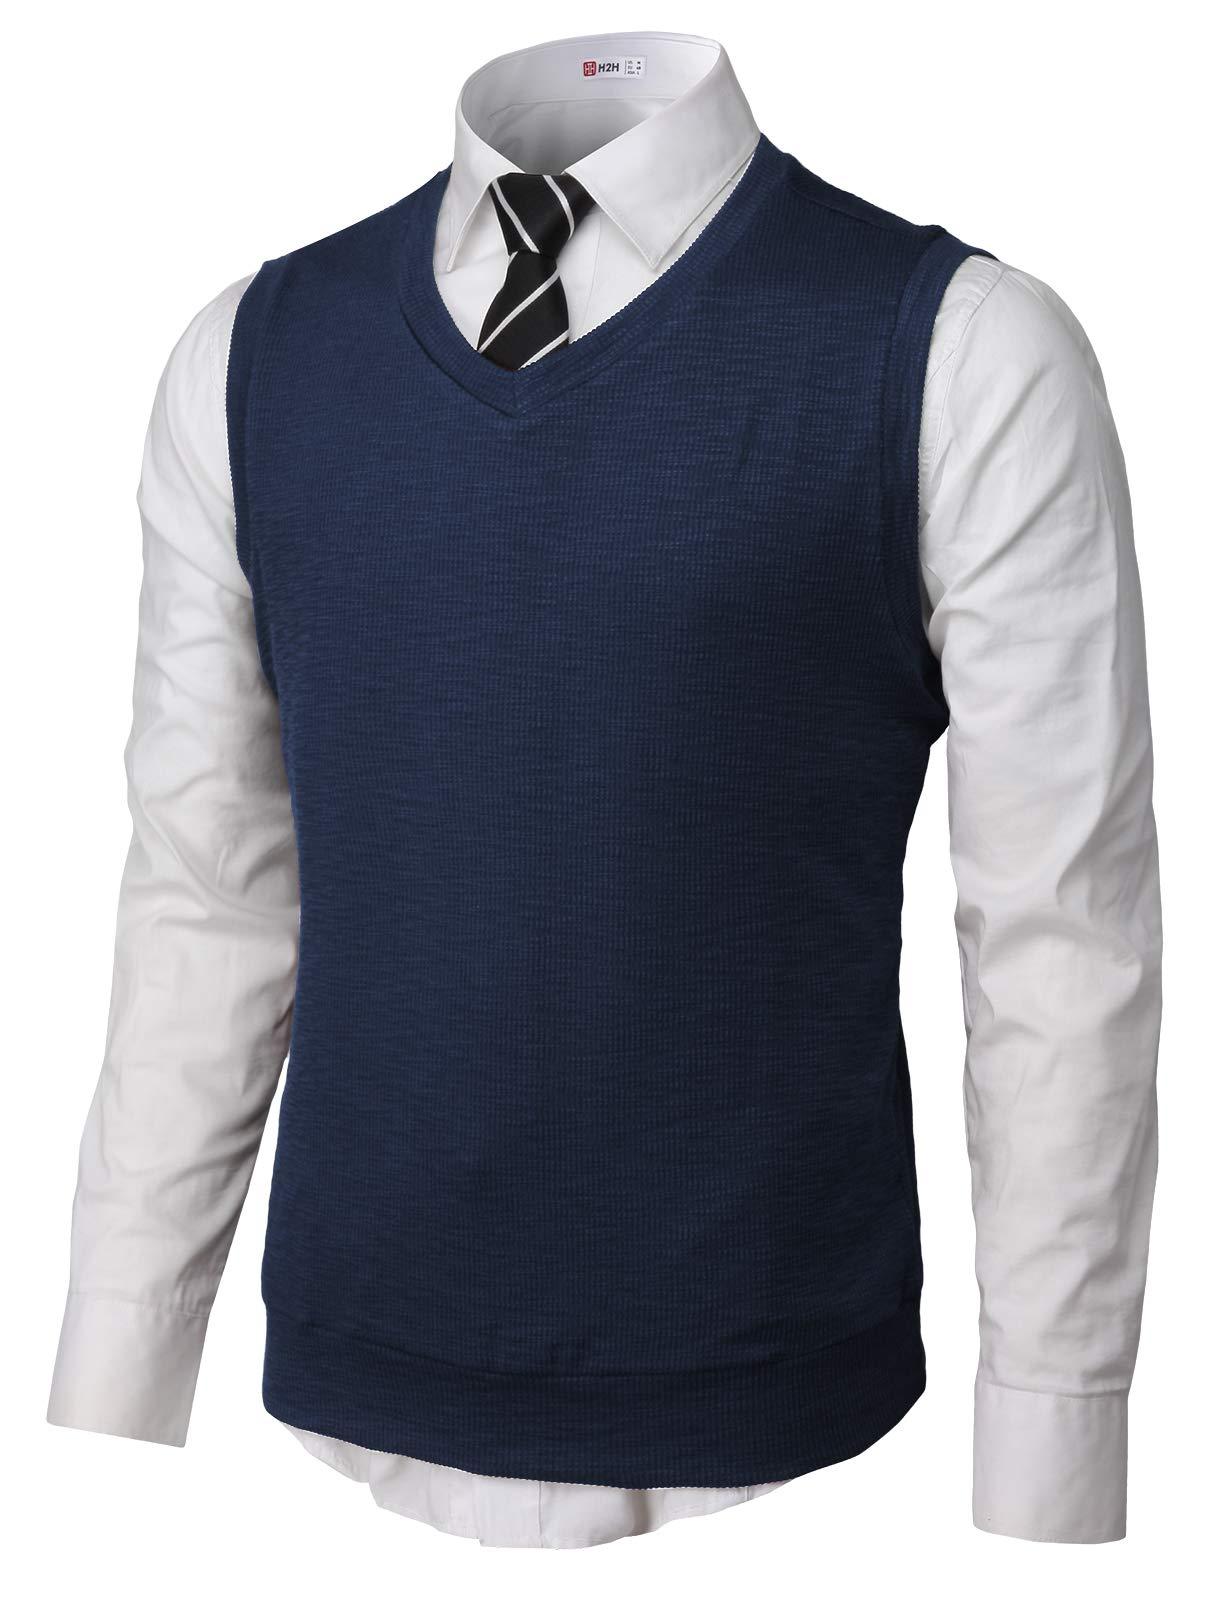 H2H Mens Cotton Blended Knit Vest Navy US M/Asia L (CMOV049) by H2H